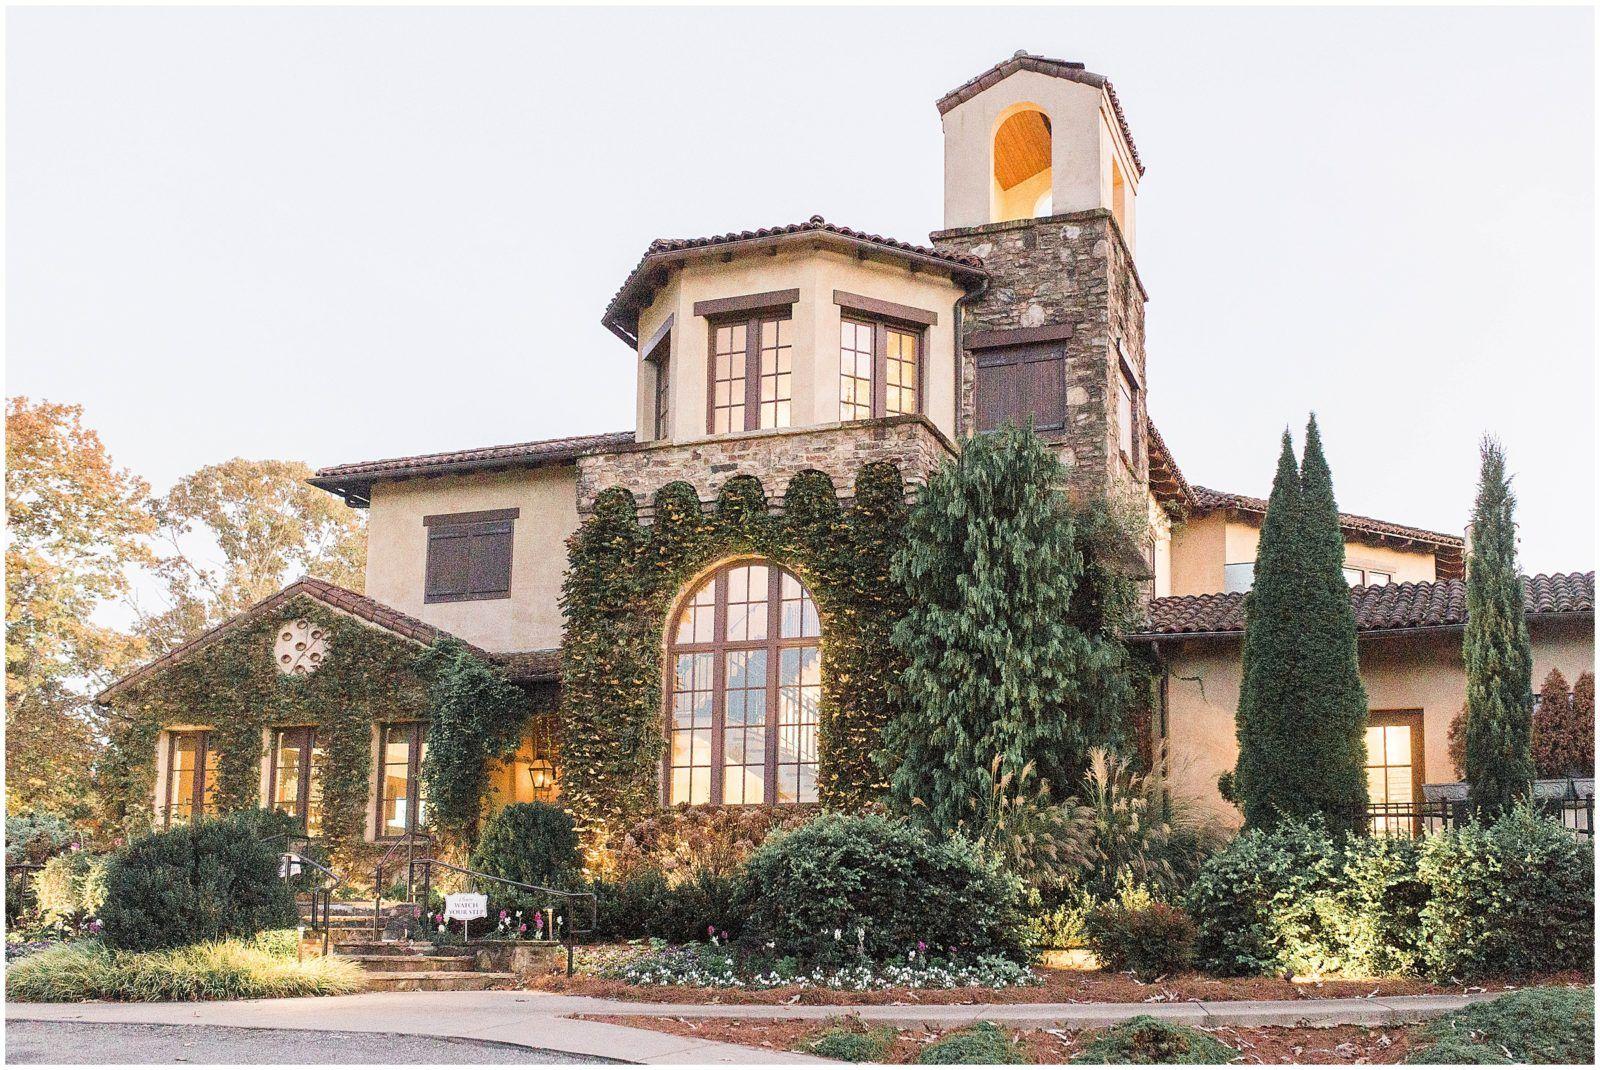 Montaluce Winery Wedding With Tuscan Inspired Details In Dahlonega Ga Tuscan Inspired Wedding Atlanta Wedding Venues Winery Weddings